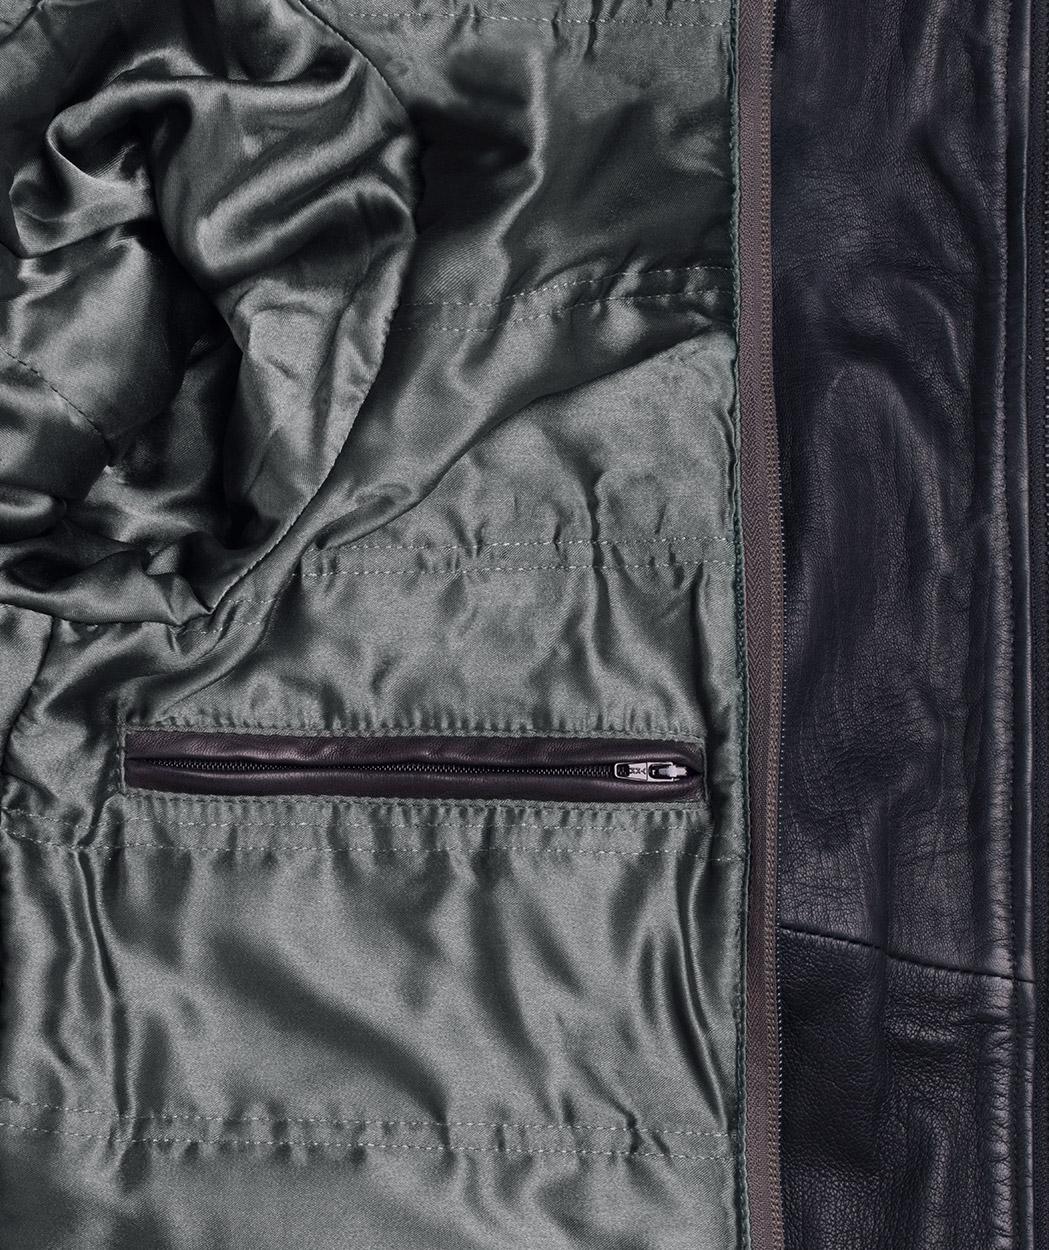 4d4ea2ba7c49 Mens Leather Jacket with Hood Vintage Black Bomber - Genuine Leather